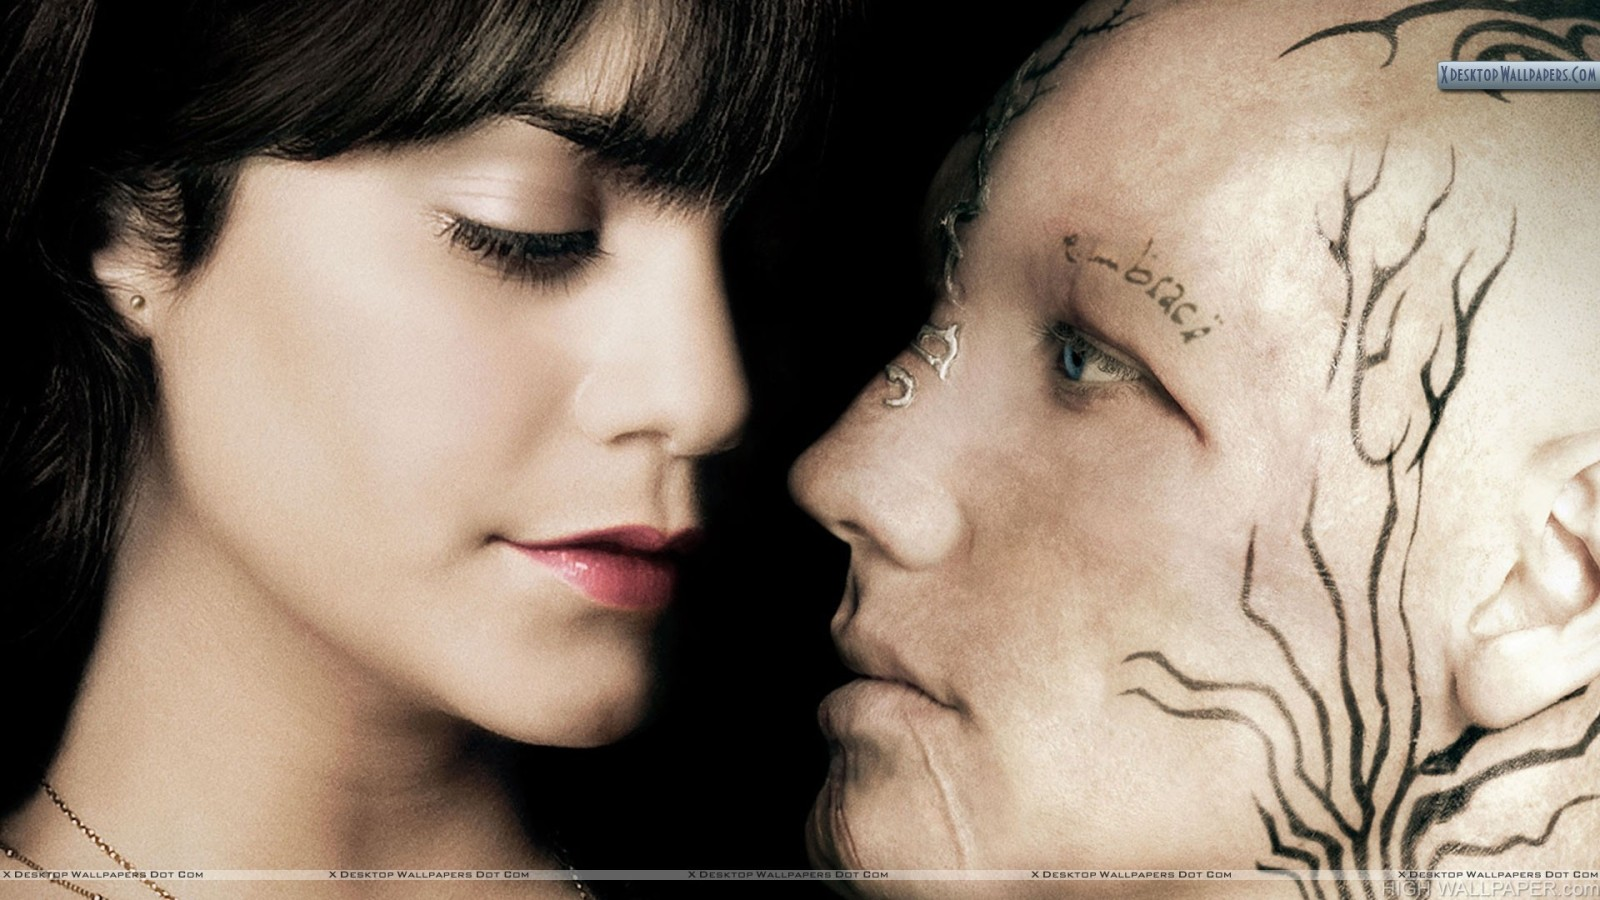 Vanessa Hudgens Face Closeup Kissing in Beastly HD Wallpaper 1600x900